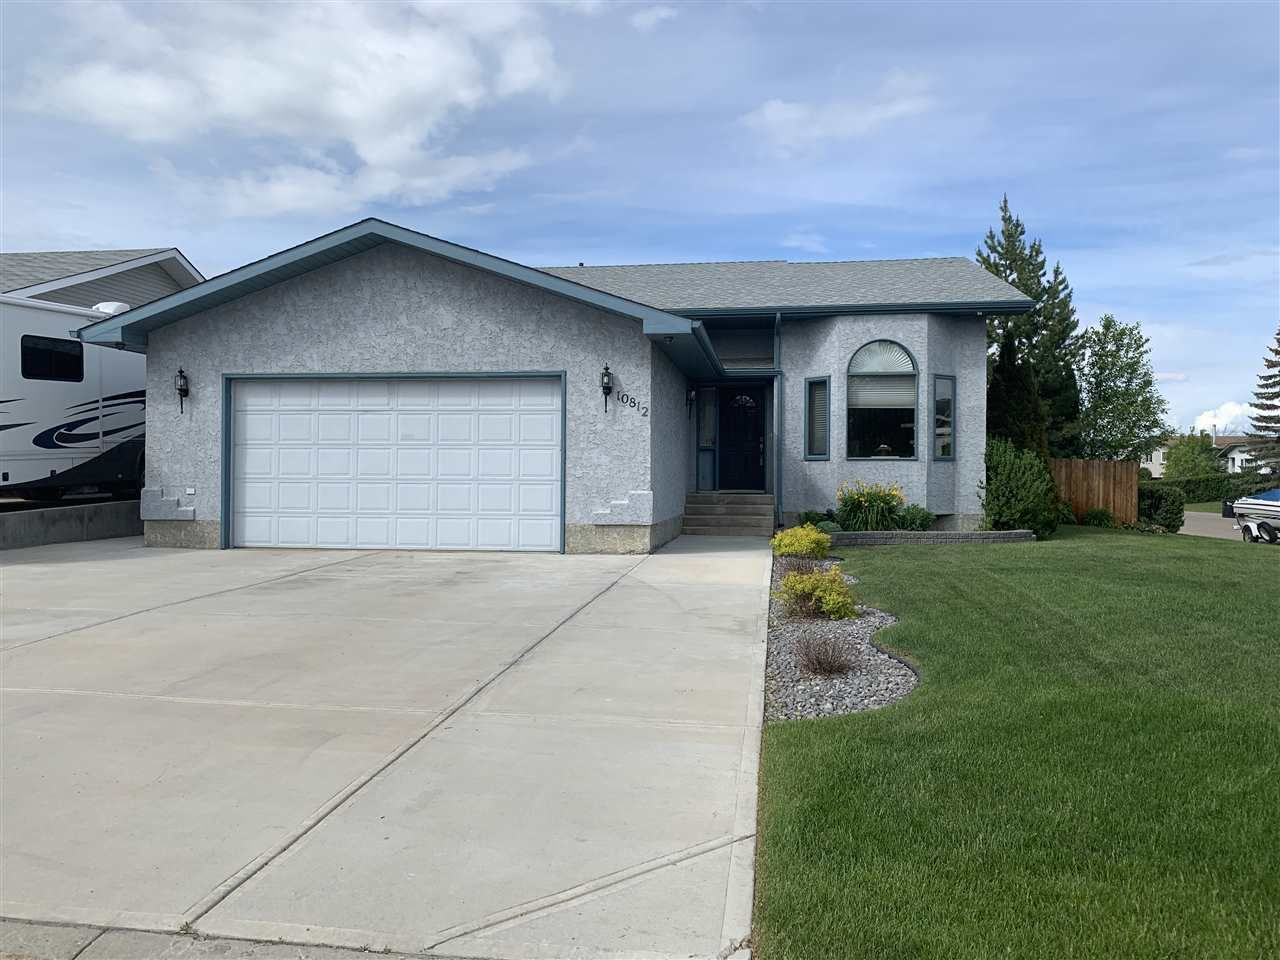 Main Photo: 10812 107 Street: Westlock House for sale : MLS®# E4160458